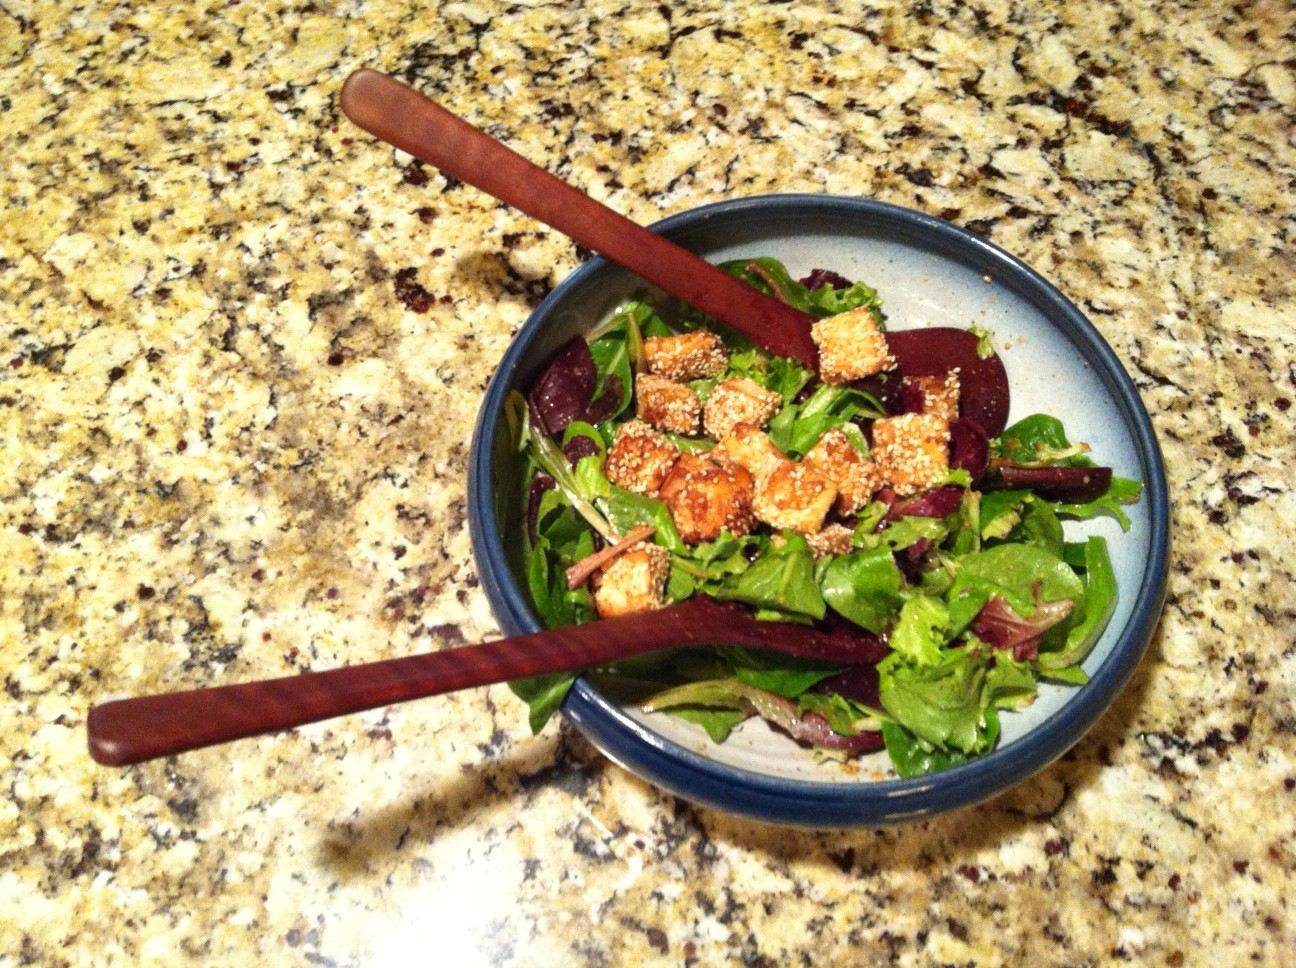 Salade verte et bouchées de tofu au sésame